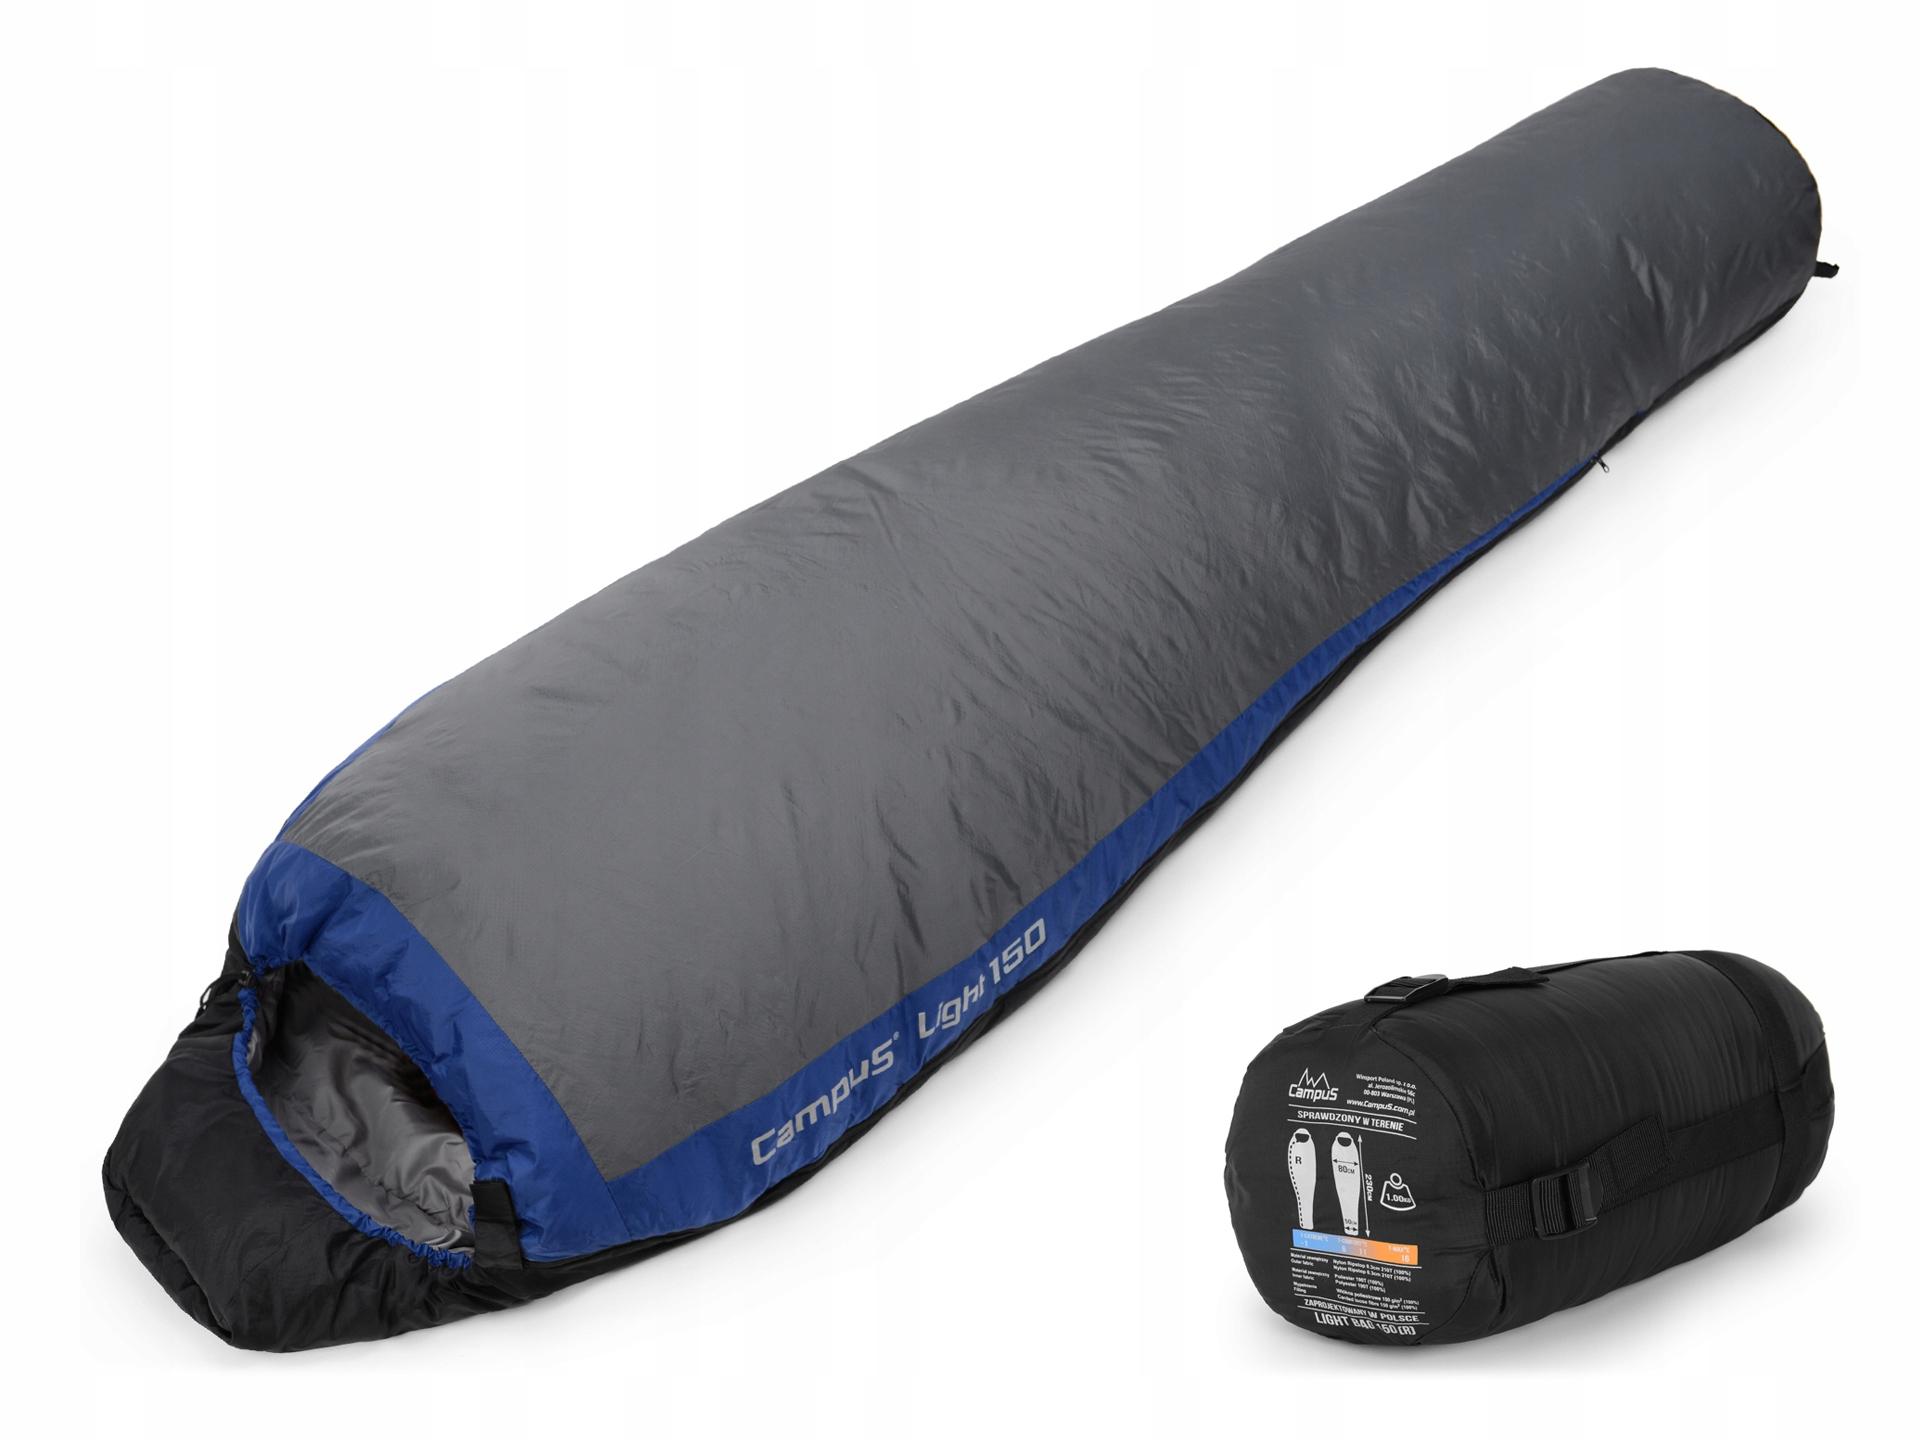 ULTRALEKKI ŚPIWOR MUMIA CAMPUS LIGHT BAG 150 1kg